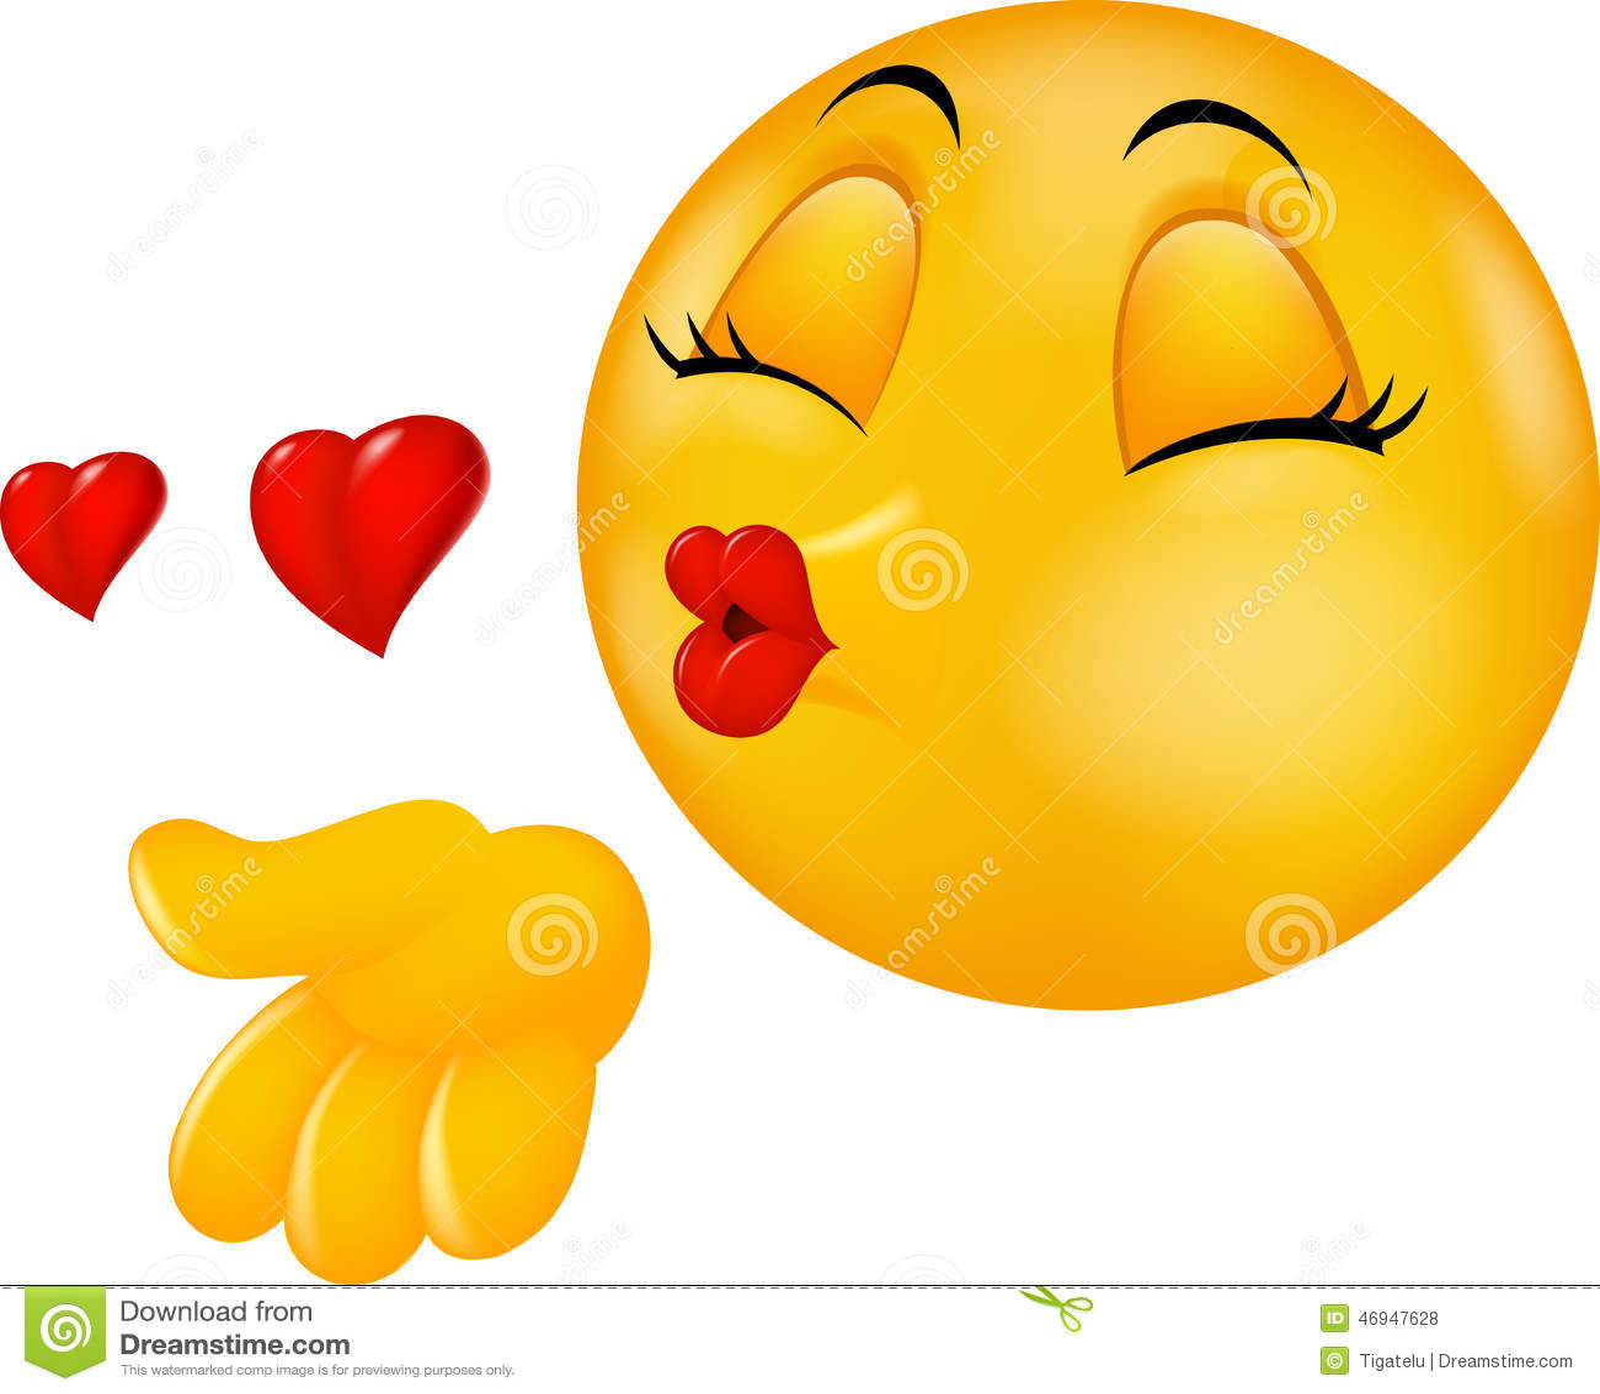 Kiss Emoticon 10